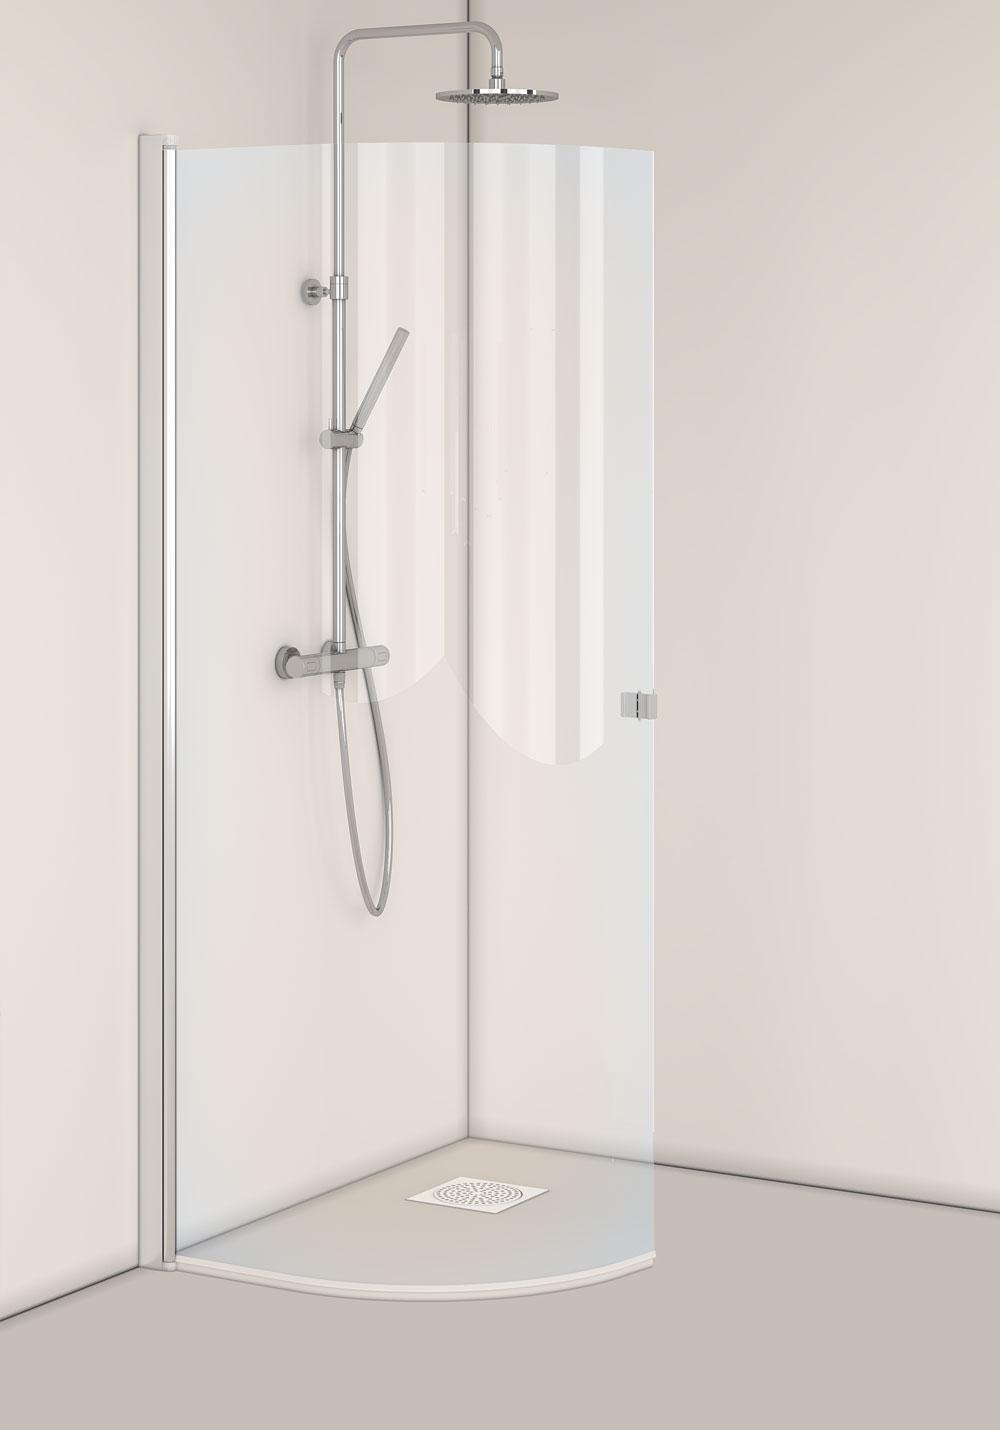 Hafa Igloo Pro J-Door 80 Klarglas Naturprofil i gruppen Badrum / Duschlösning / Duschdörr hos Stuvbutiken (1450350)